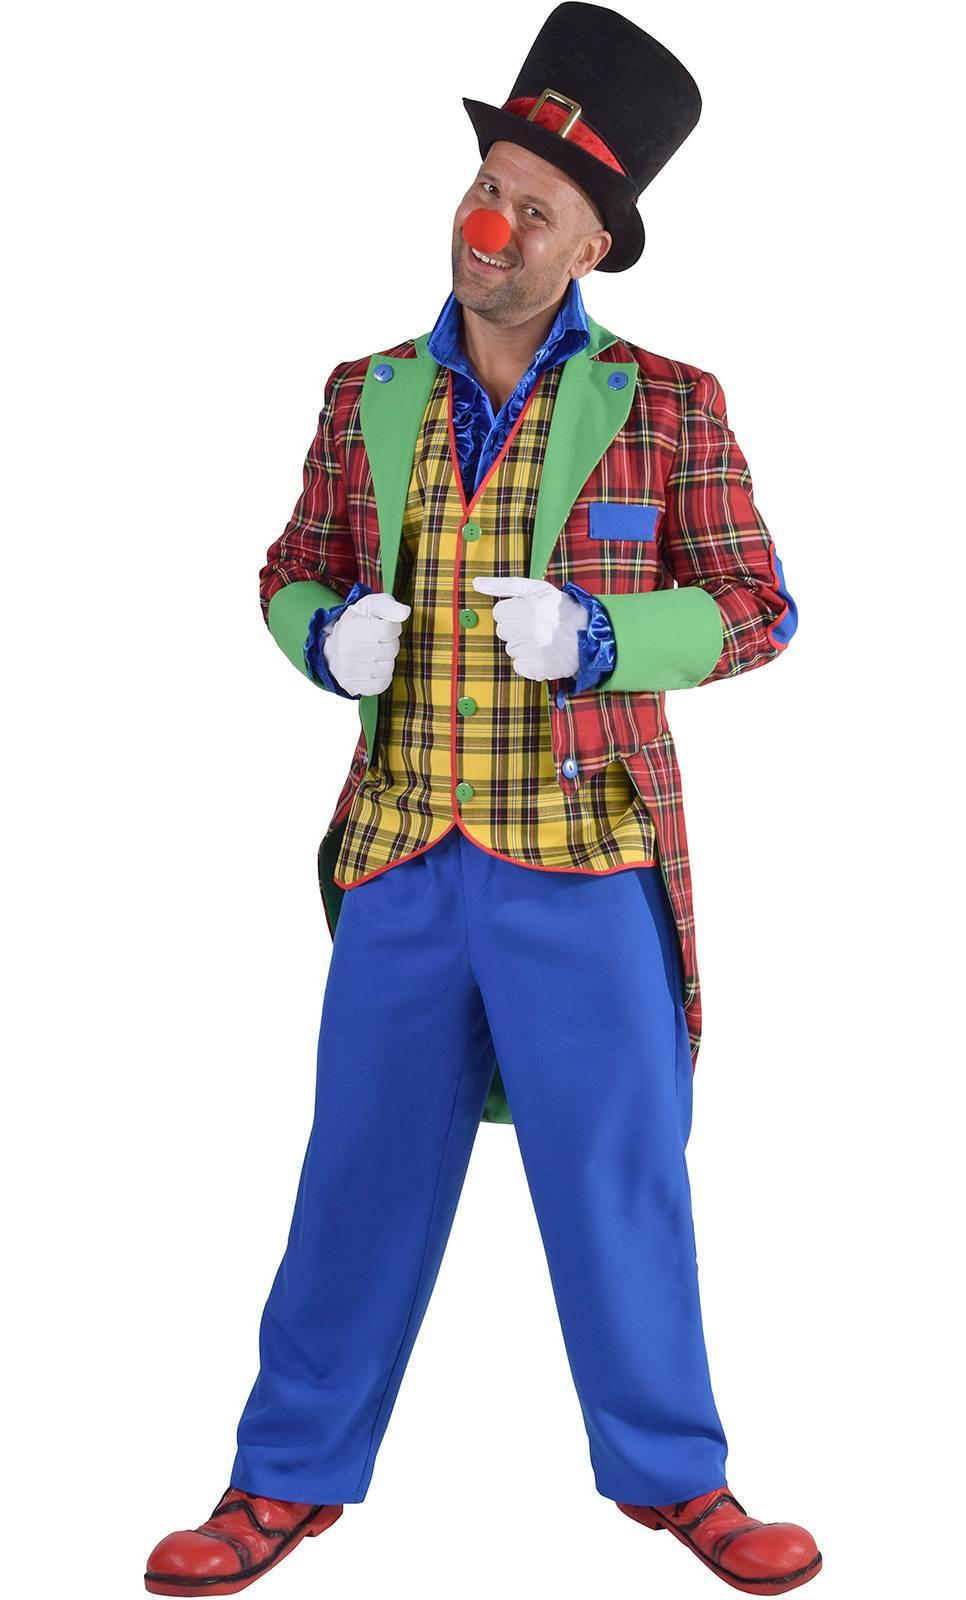 Costume de clown luxe professionnel